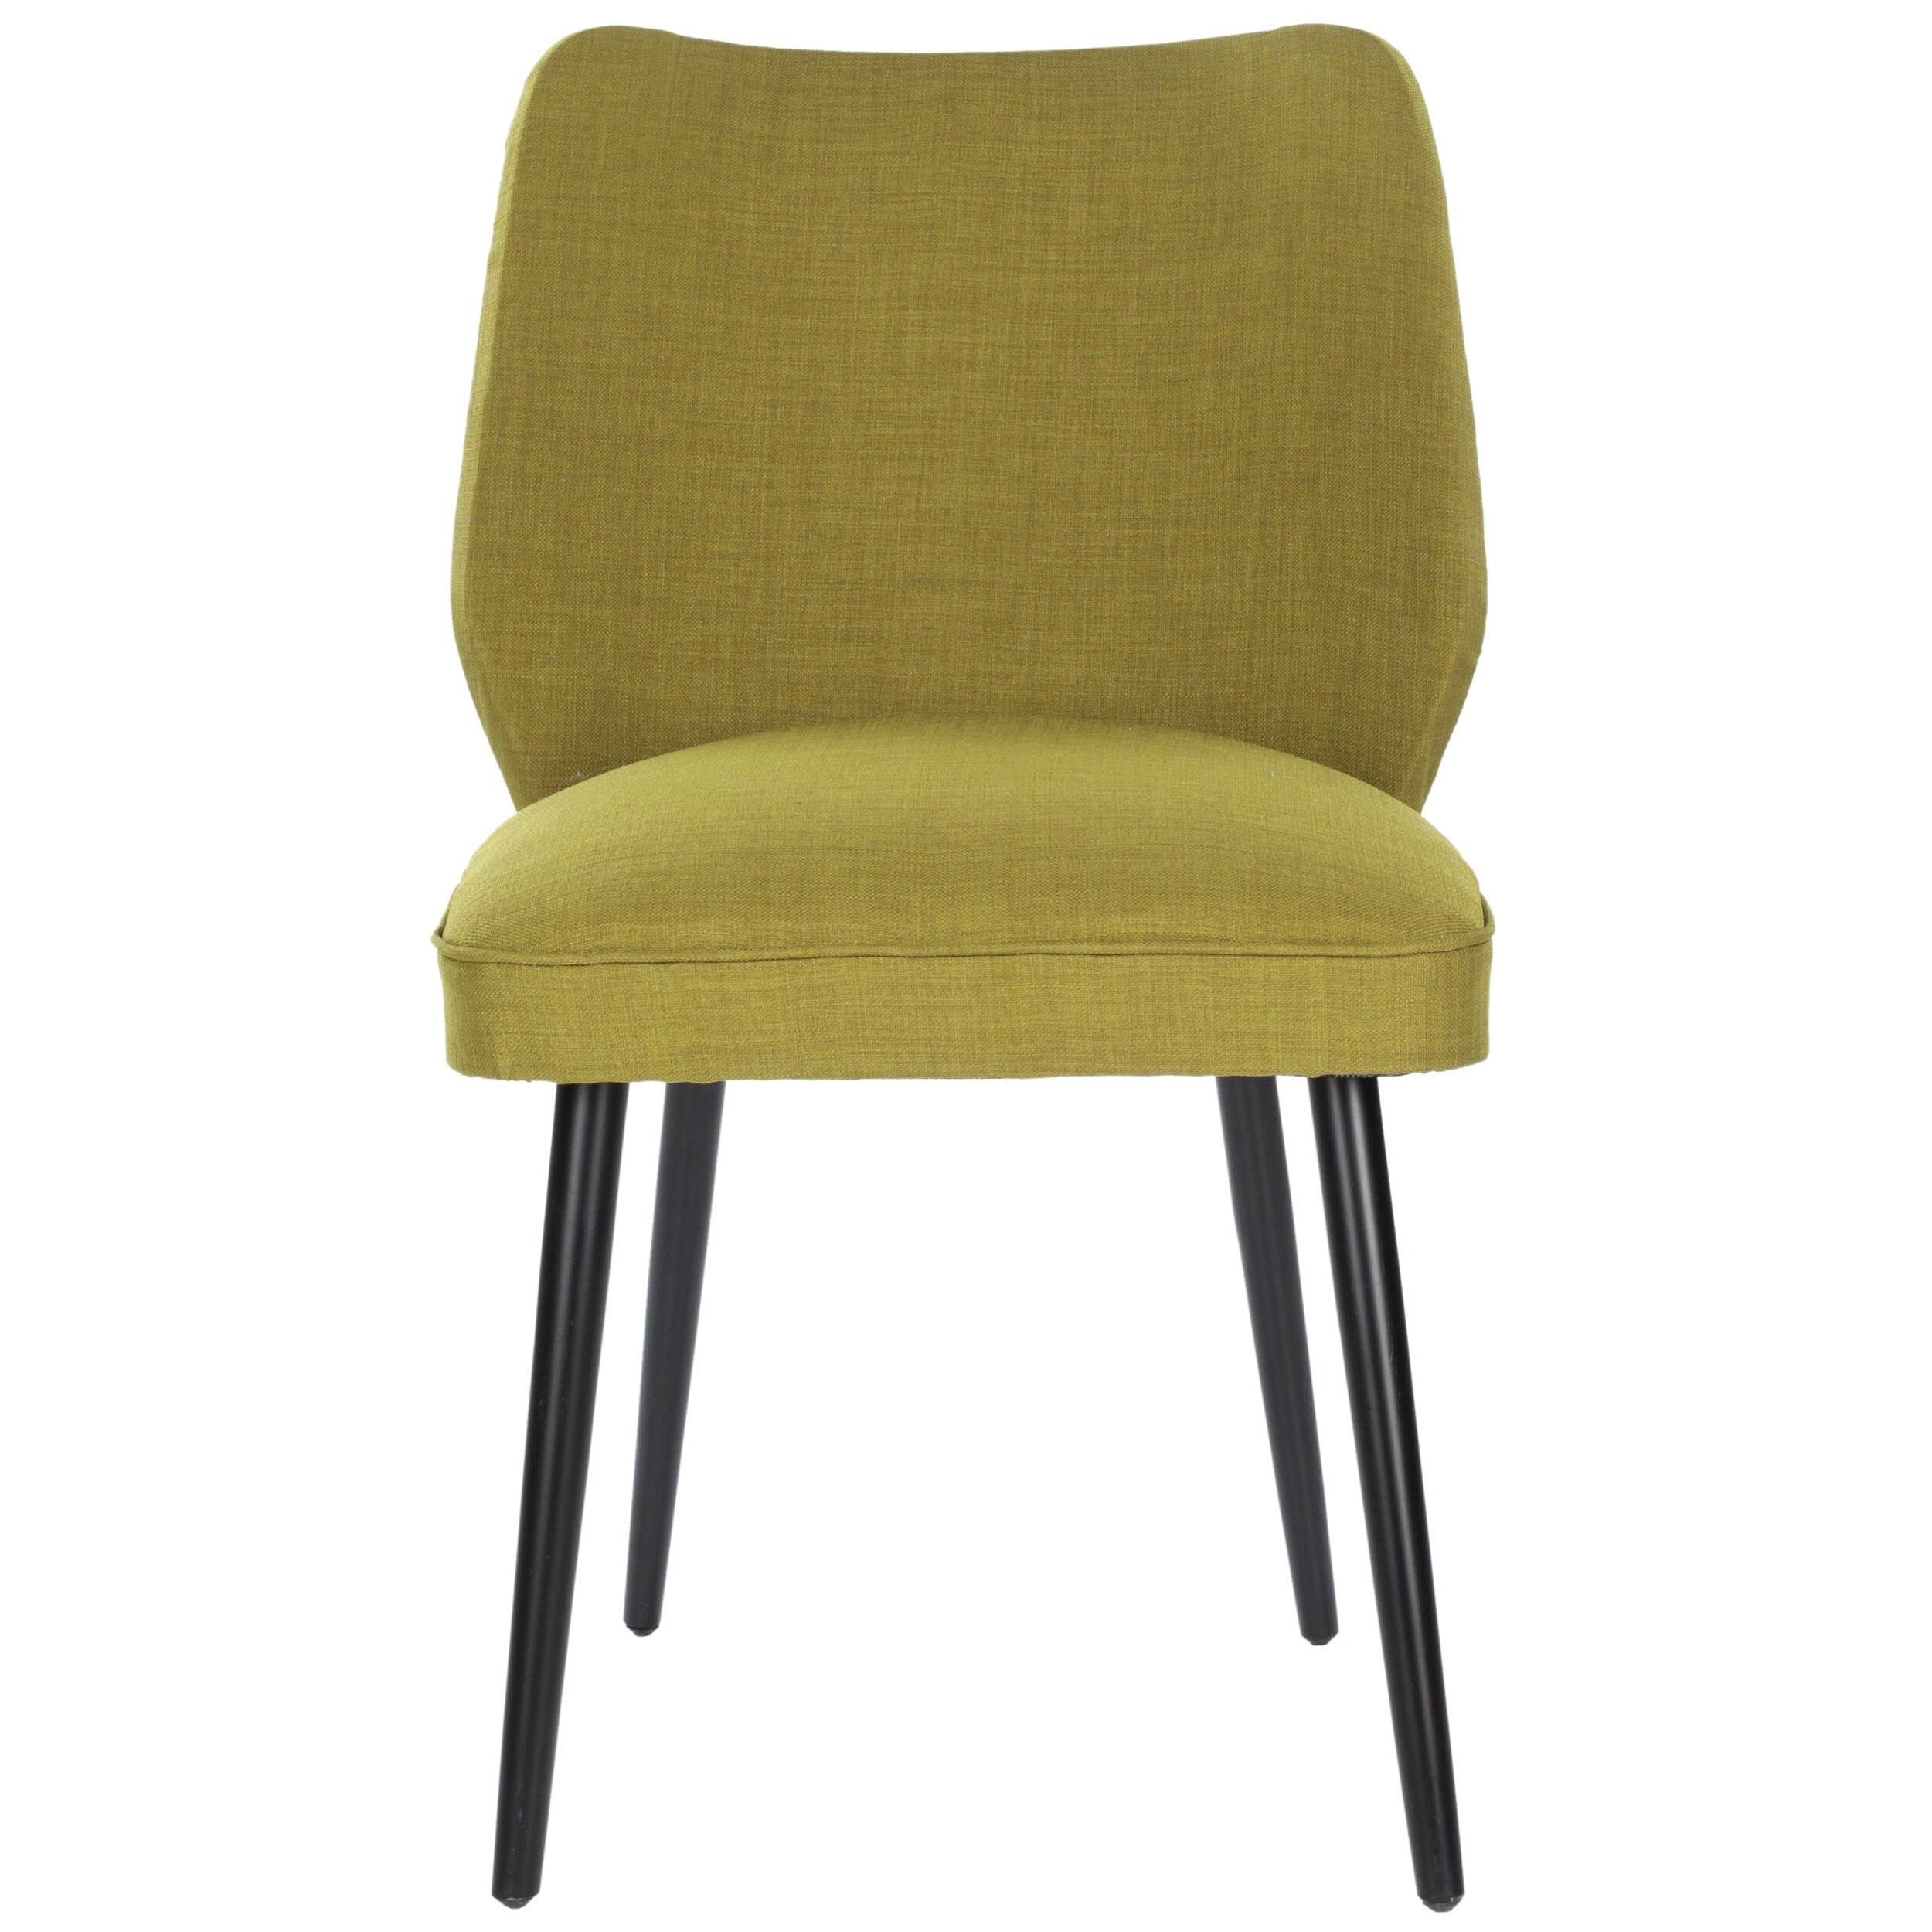 safavieh zara side chair reviews wayfair. Black Bedroom Furniture Sets. Home Design Ideas